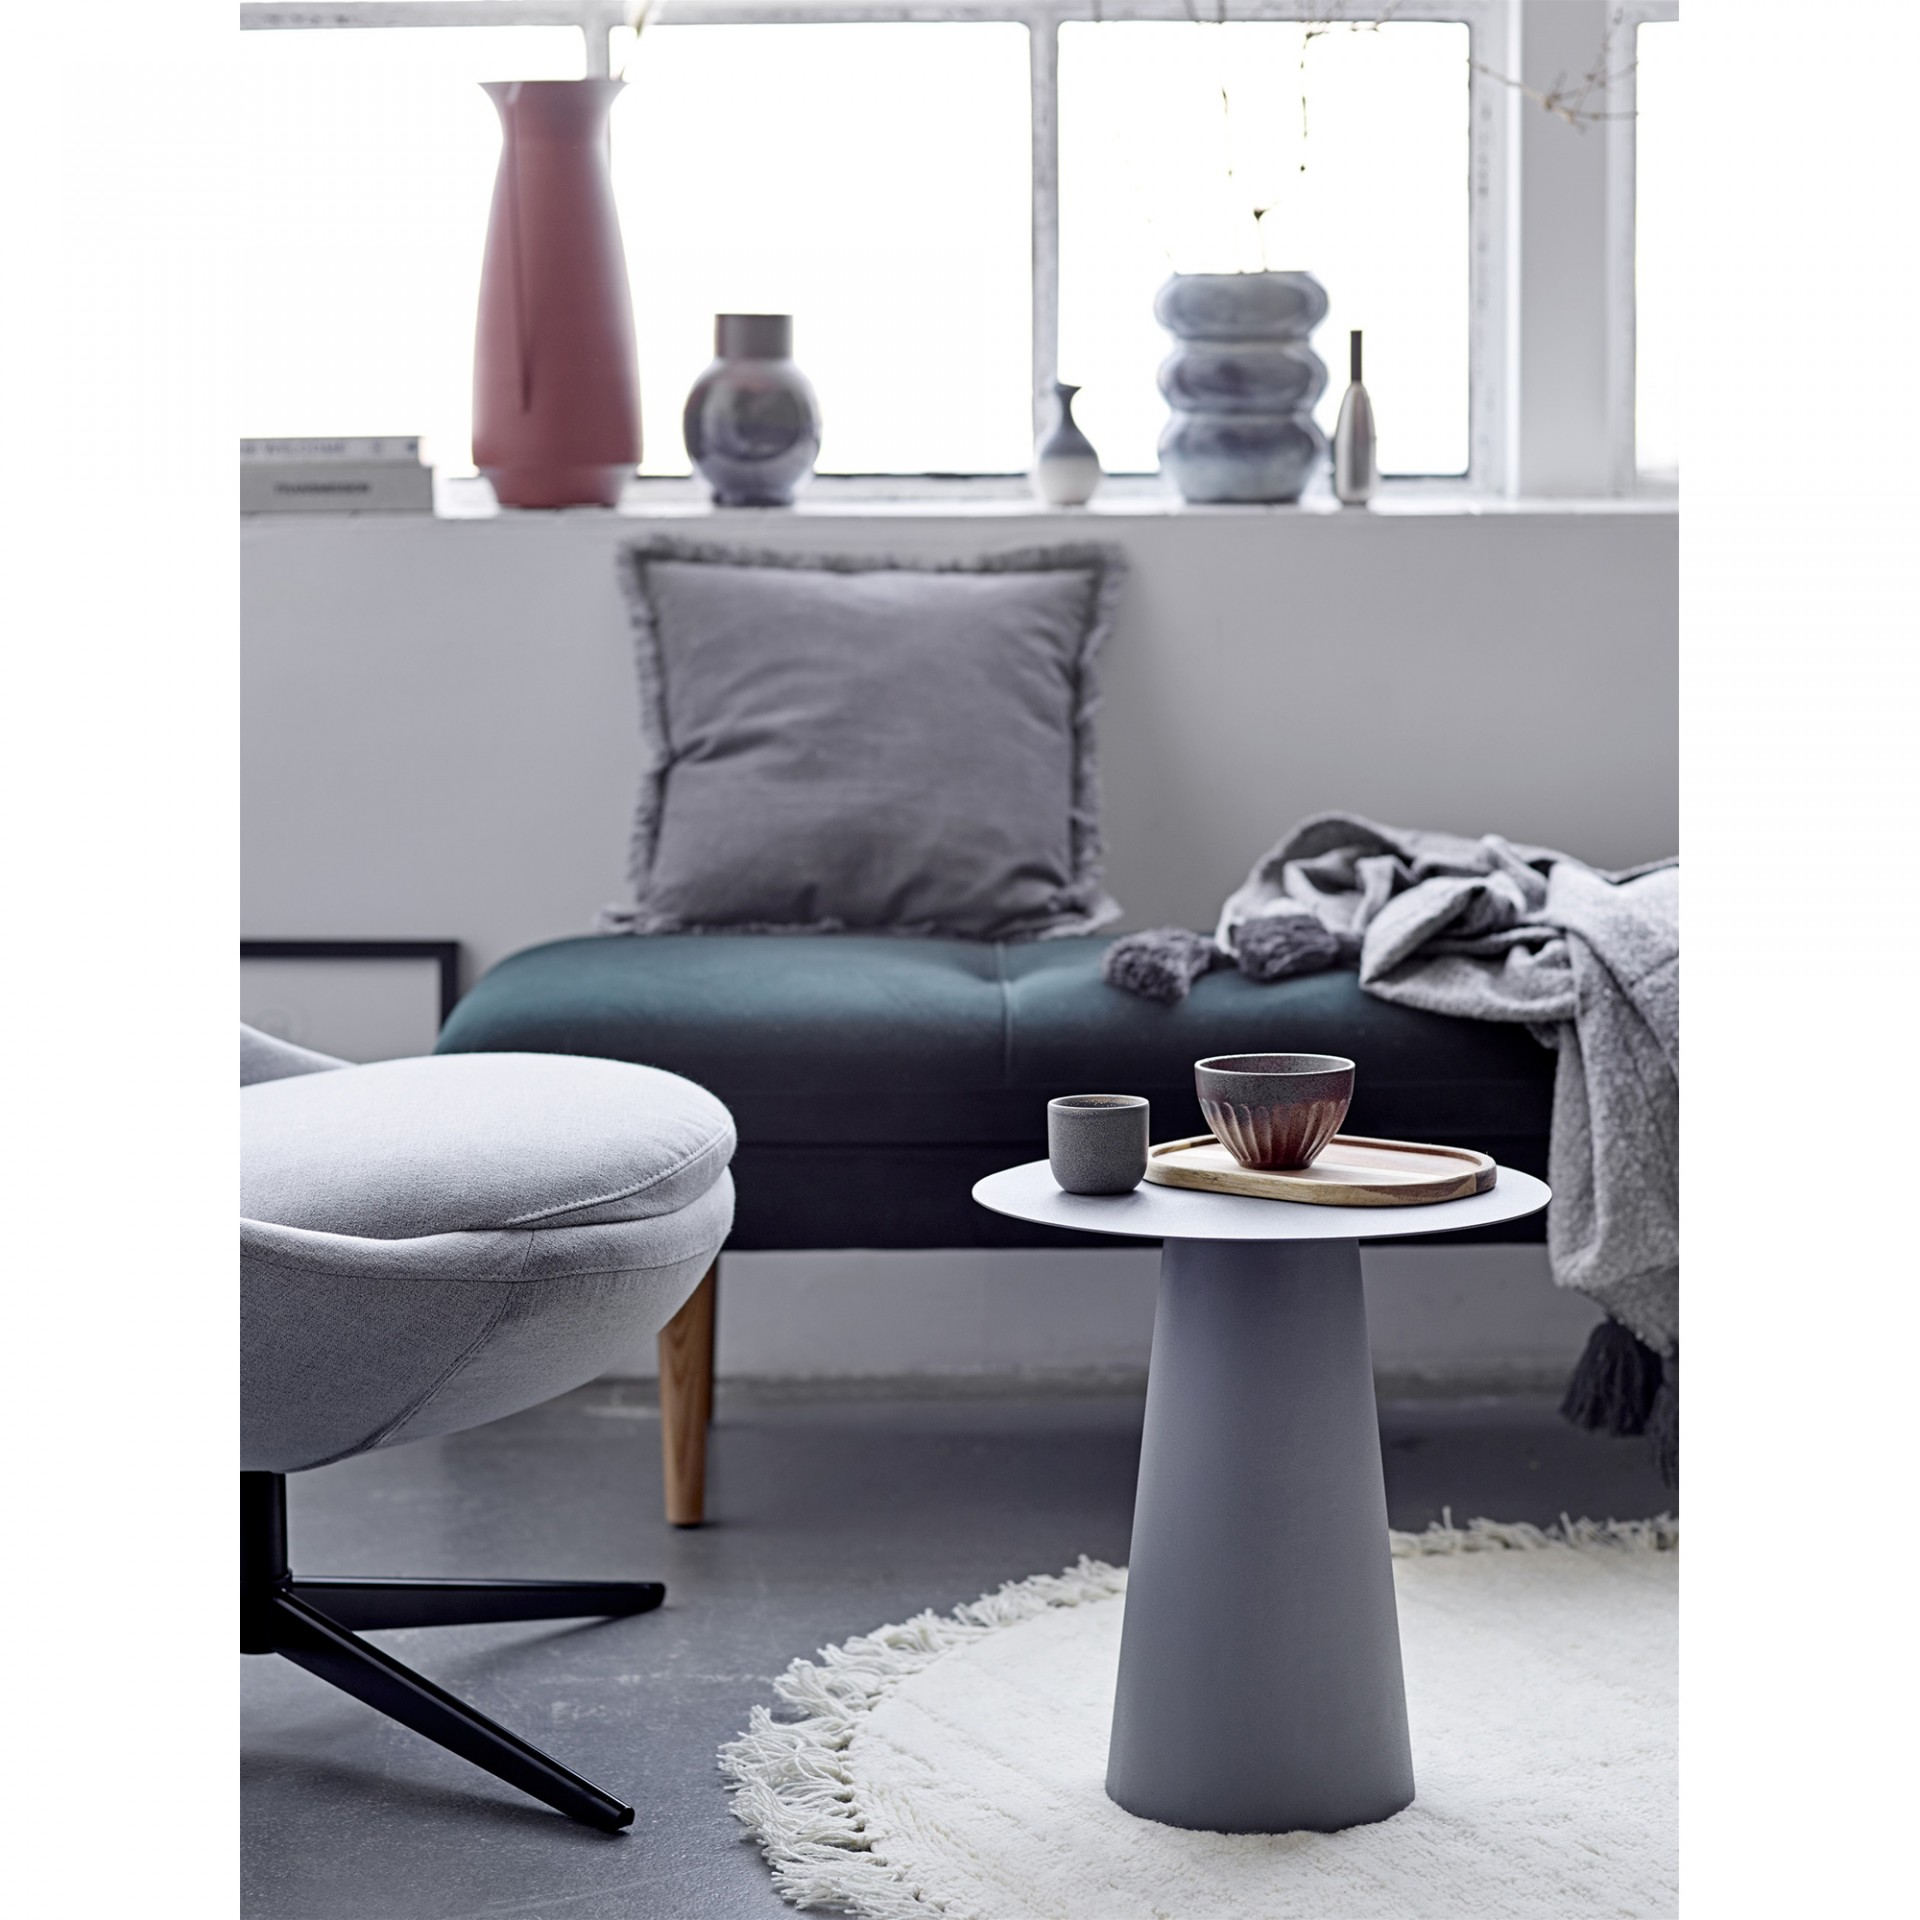 Tapete c/franjas, lã natural, branco, Ø110